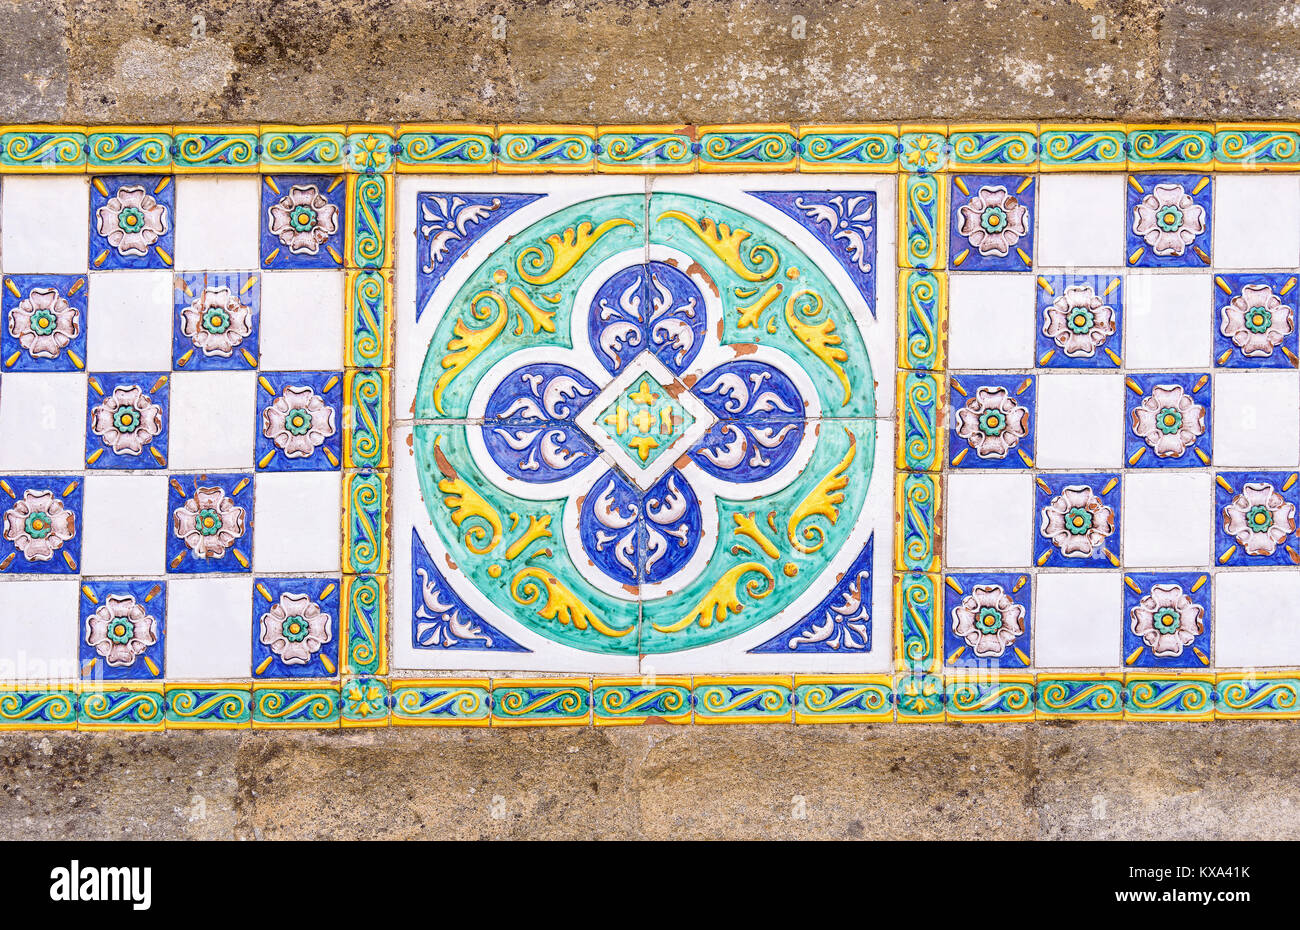 Italian ceramic pattern stock photos italian ceramic pattern colored ceramic tiles in caltagirone sicily italy stock image dailygadgetfo Images